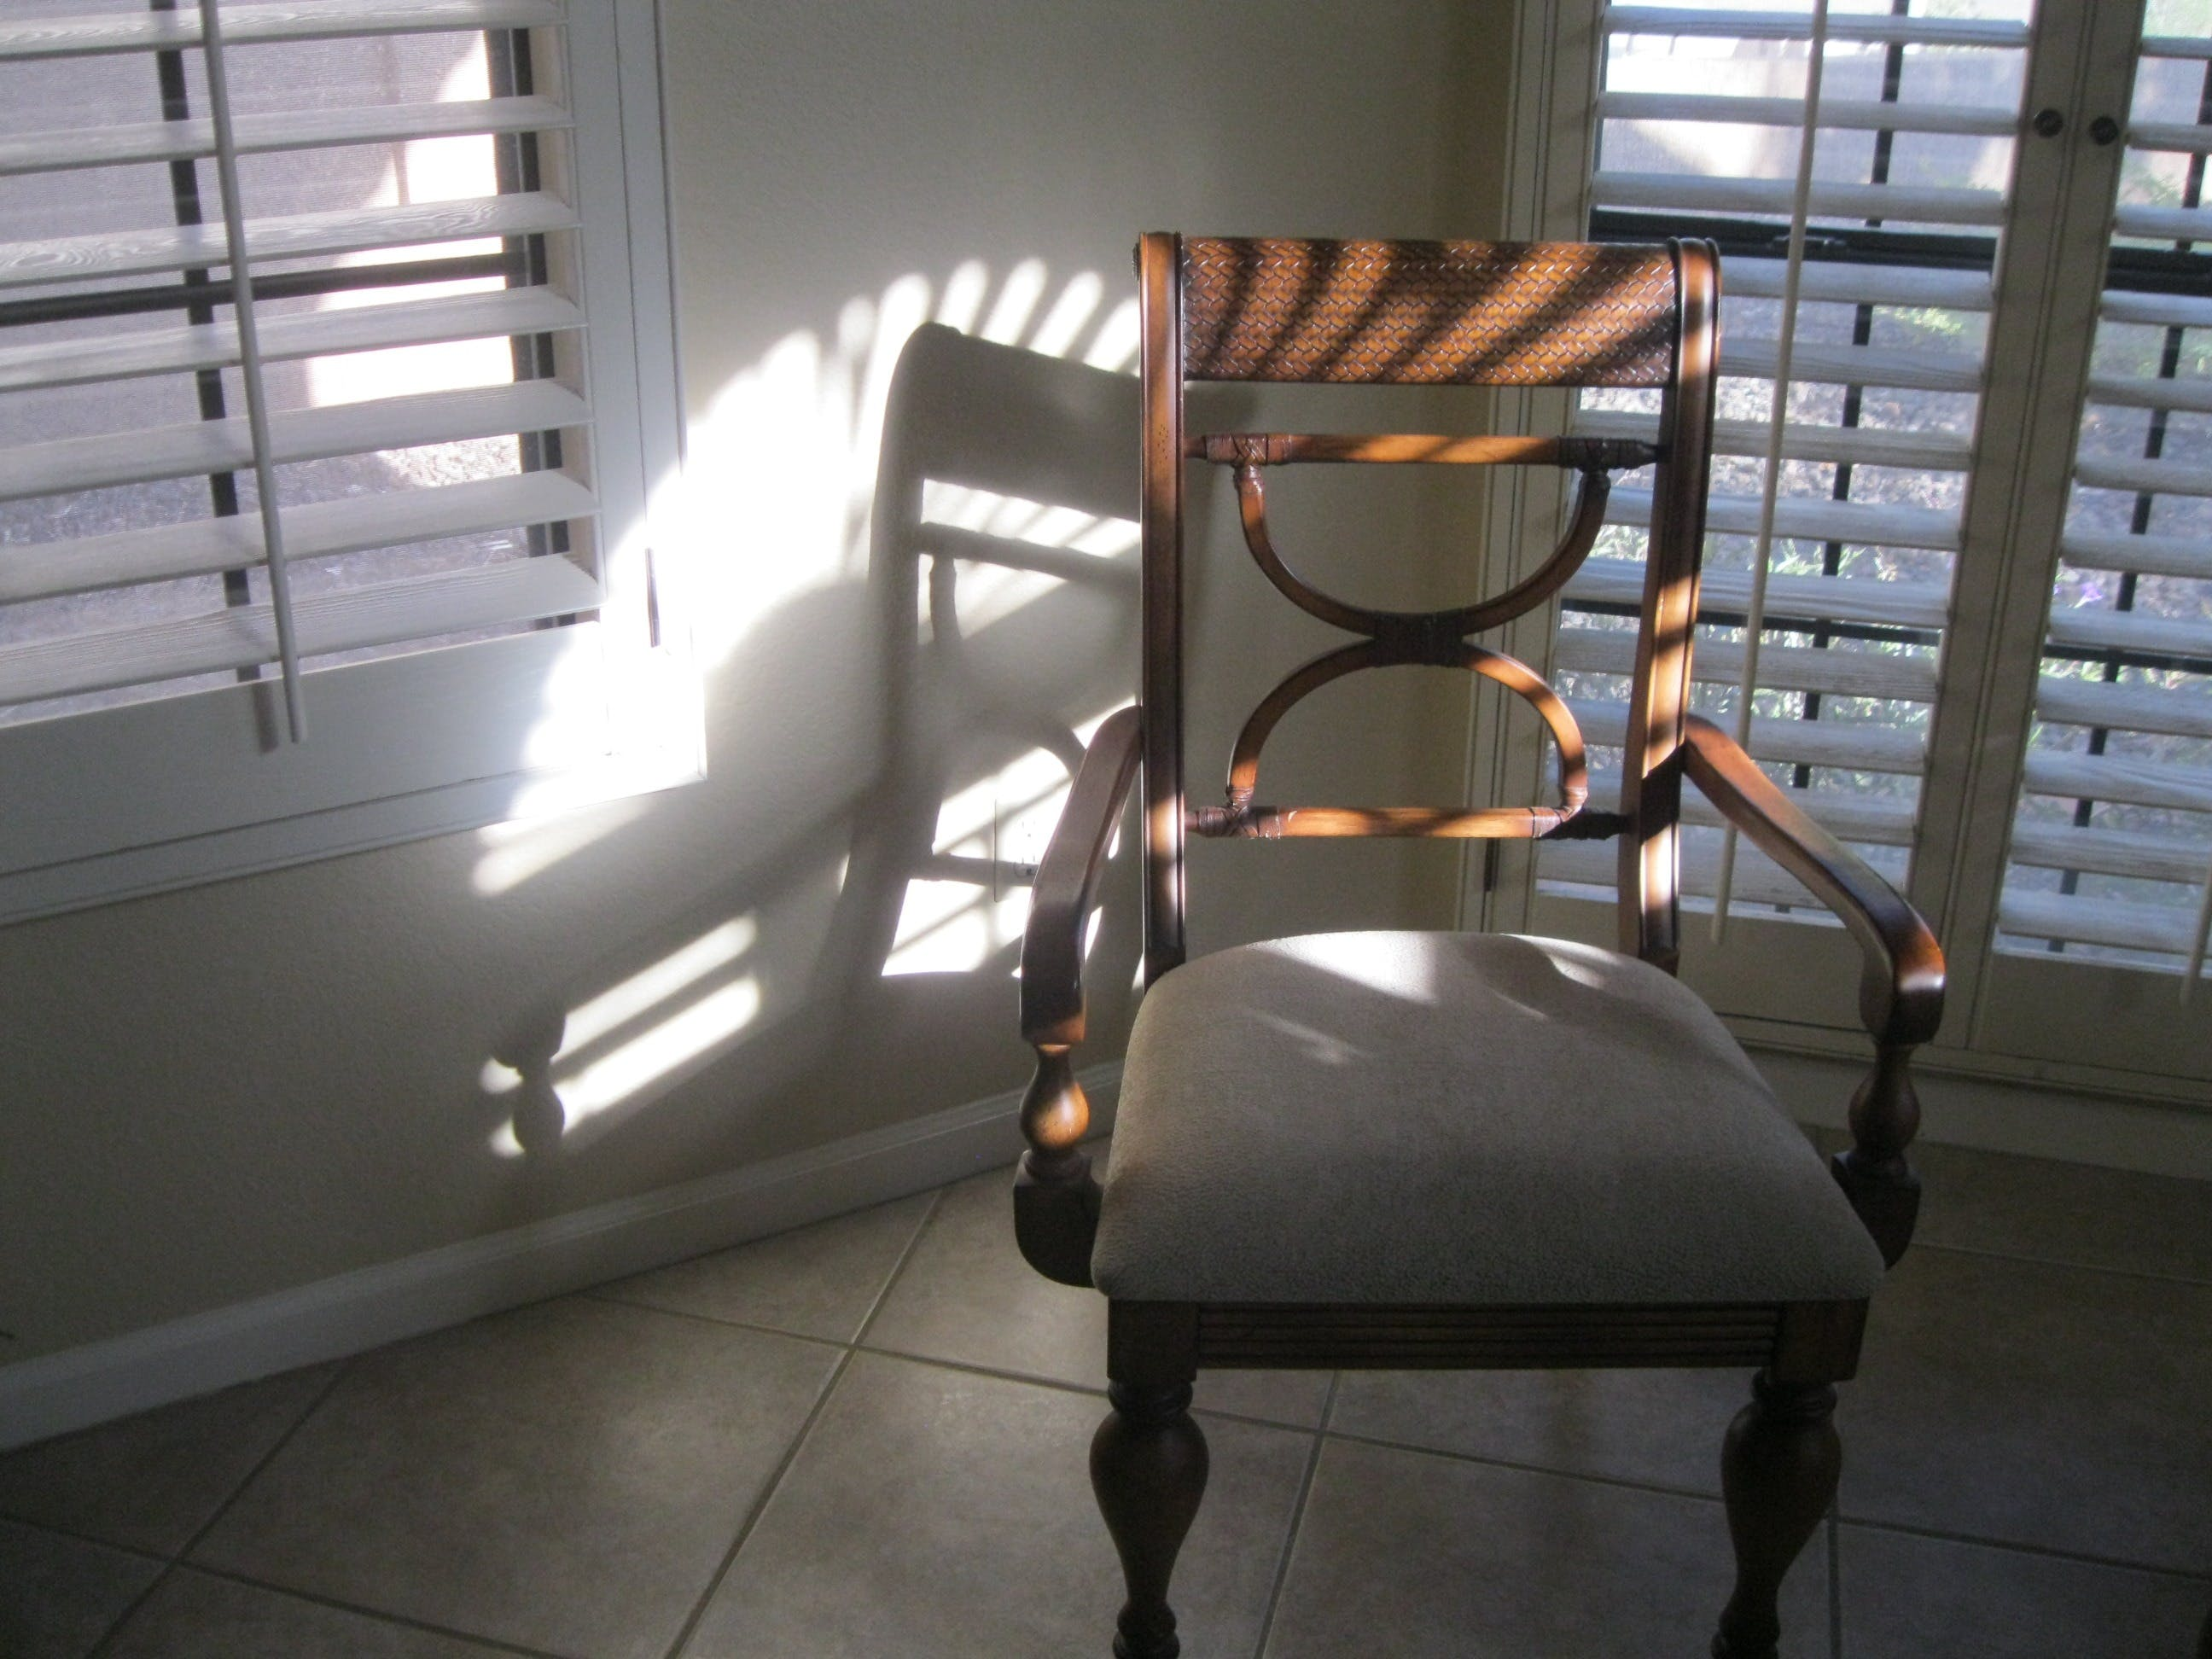 Free stock photo of light, wall, windows, room